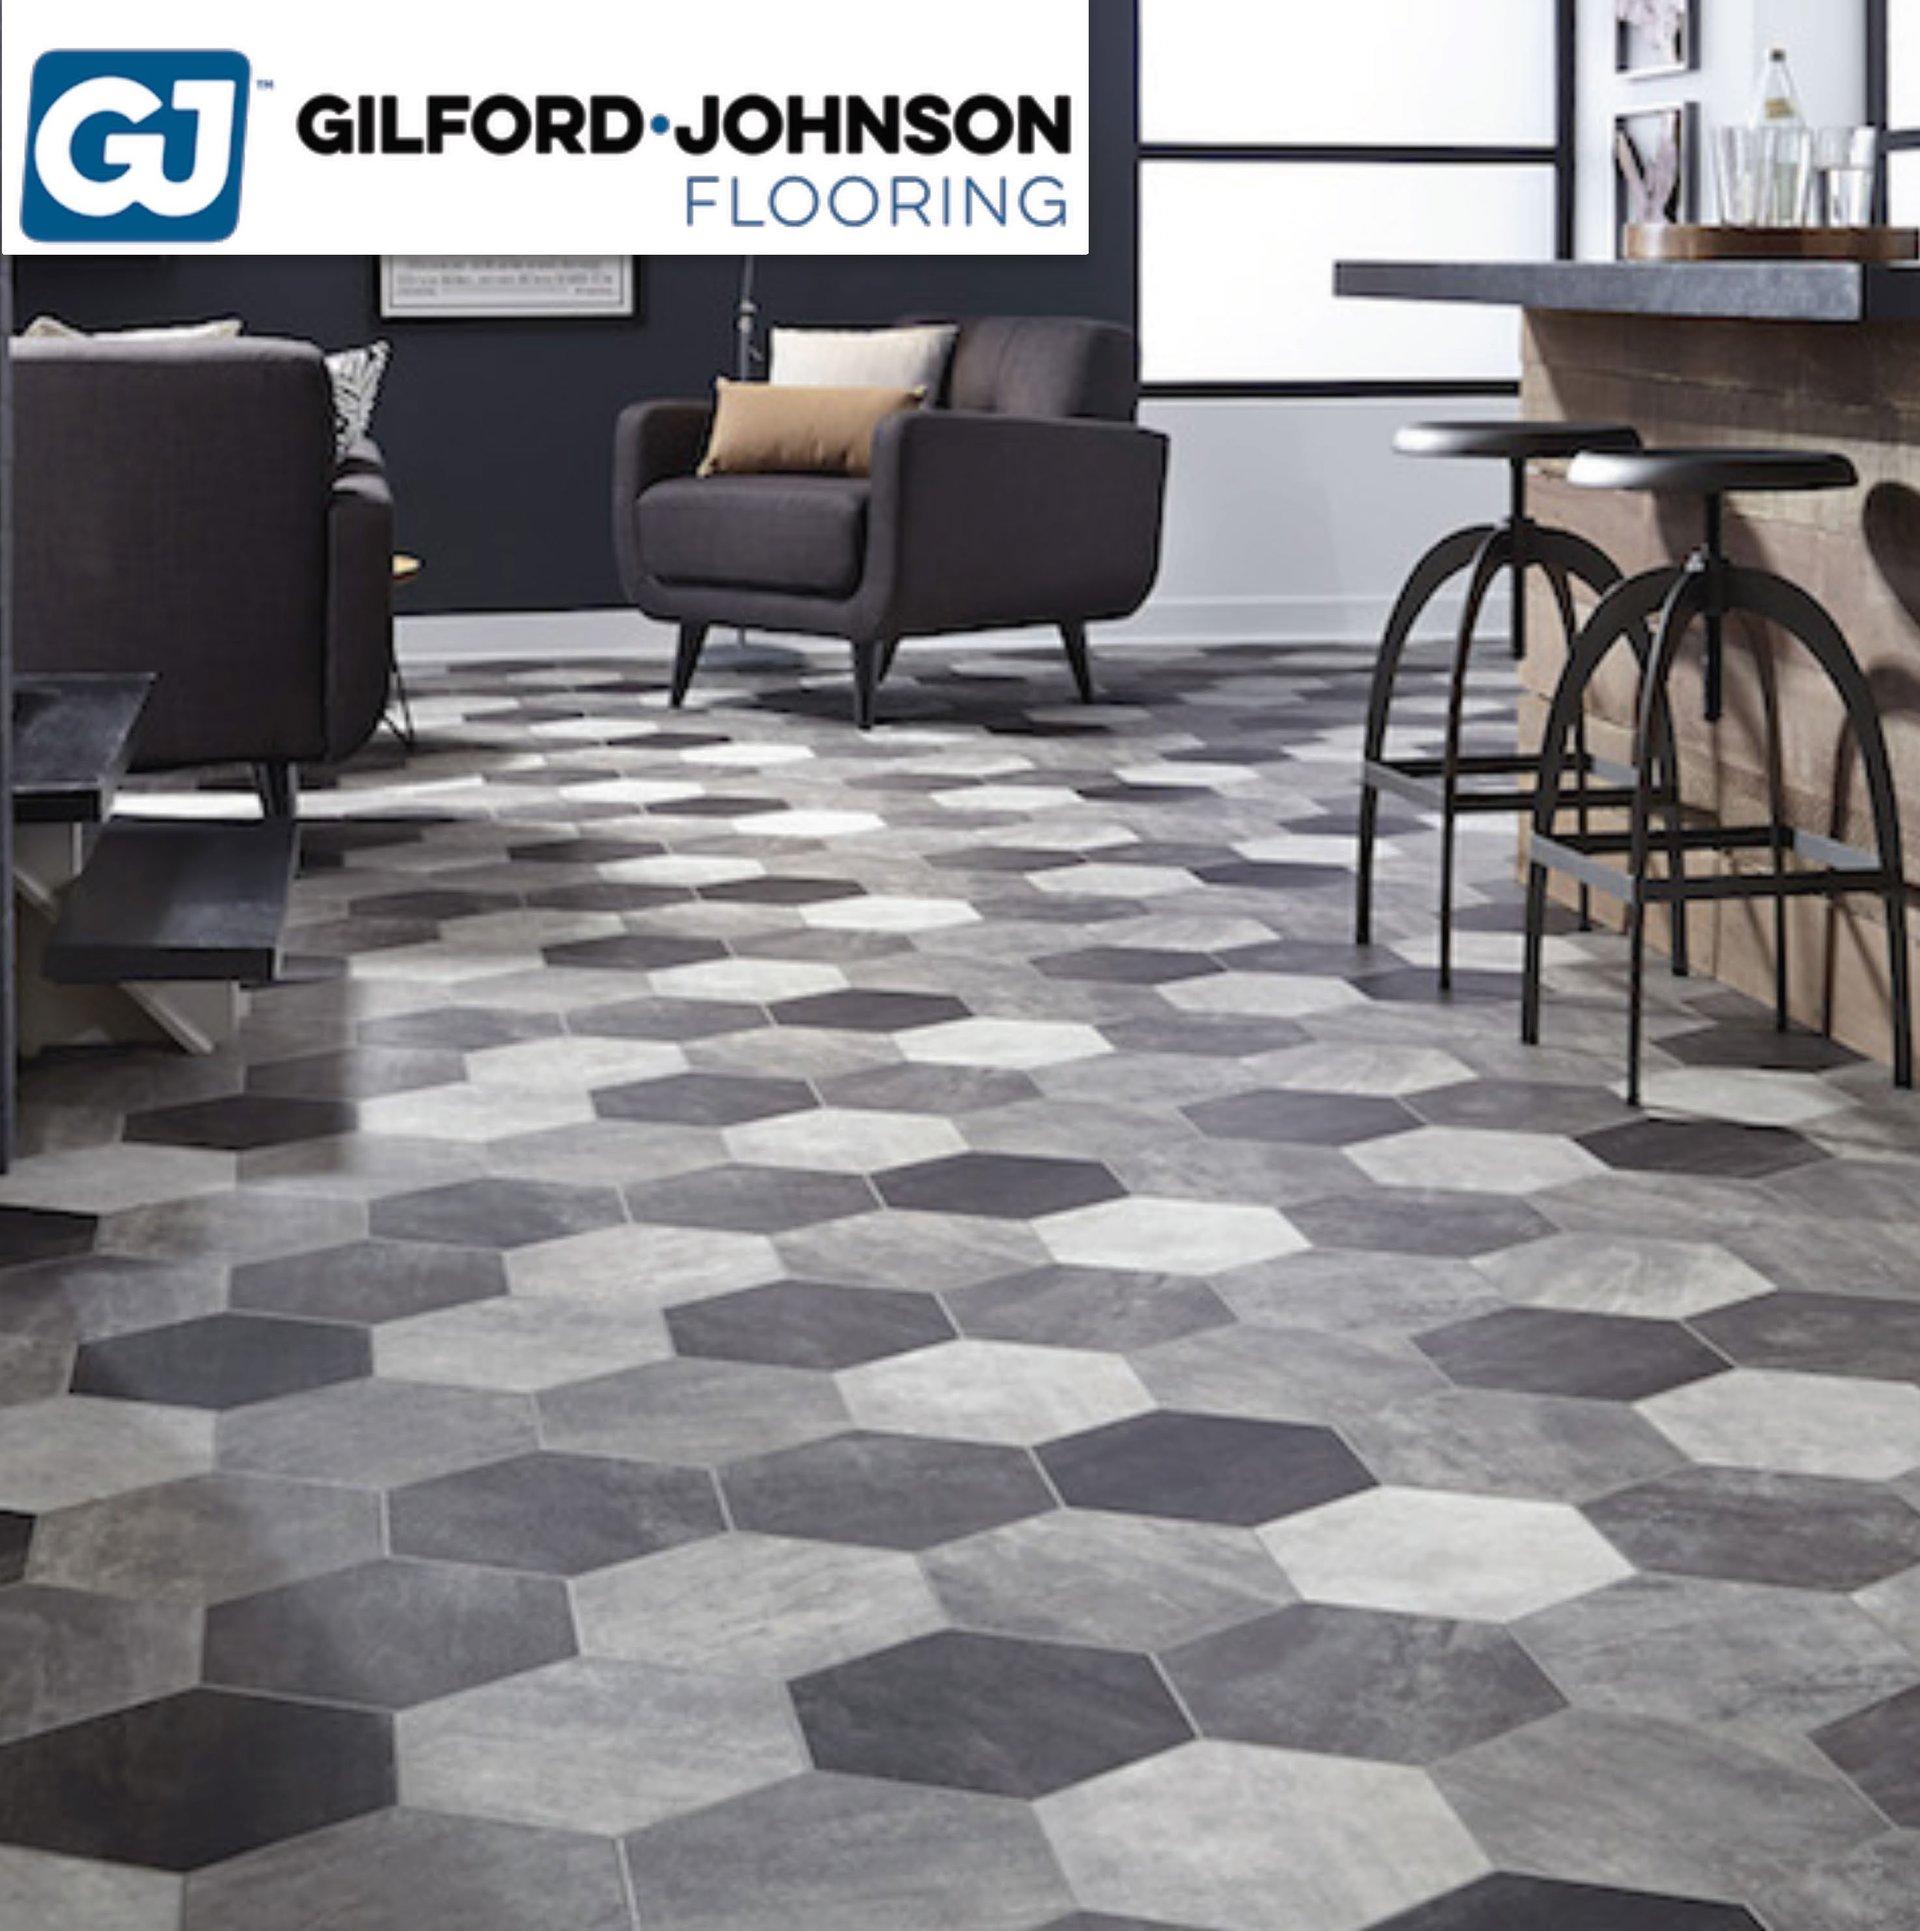 Gilford-Johnson resilient vinyl